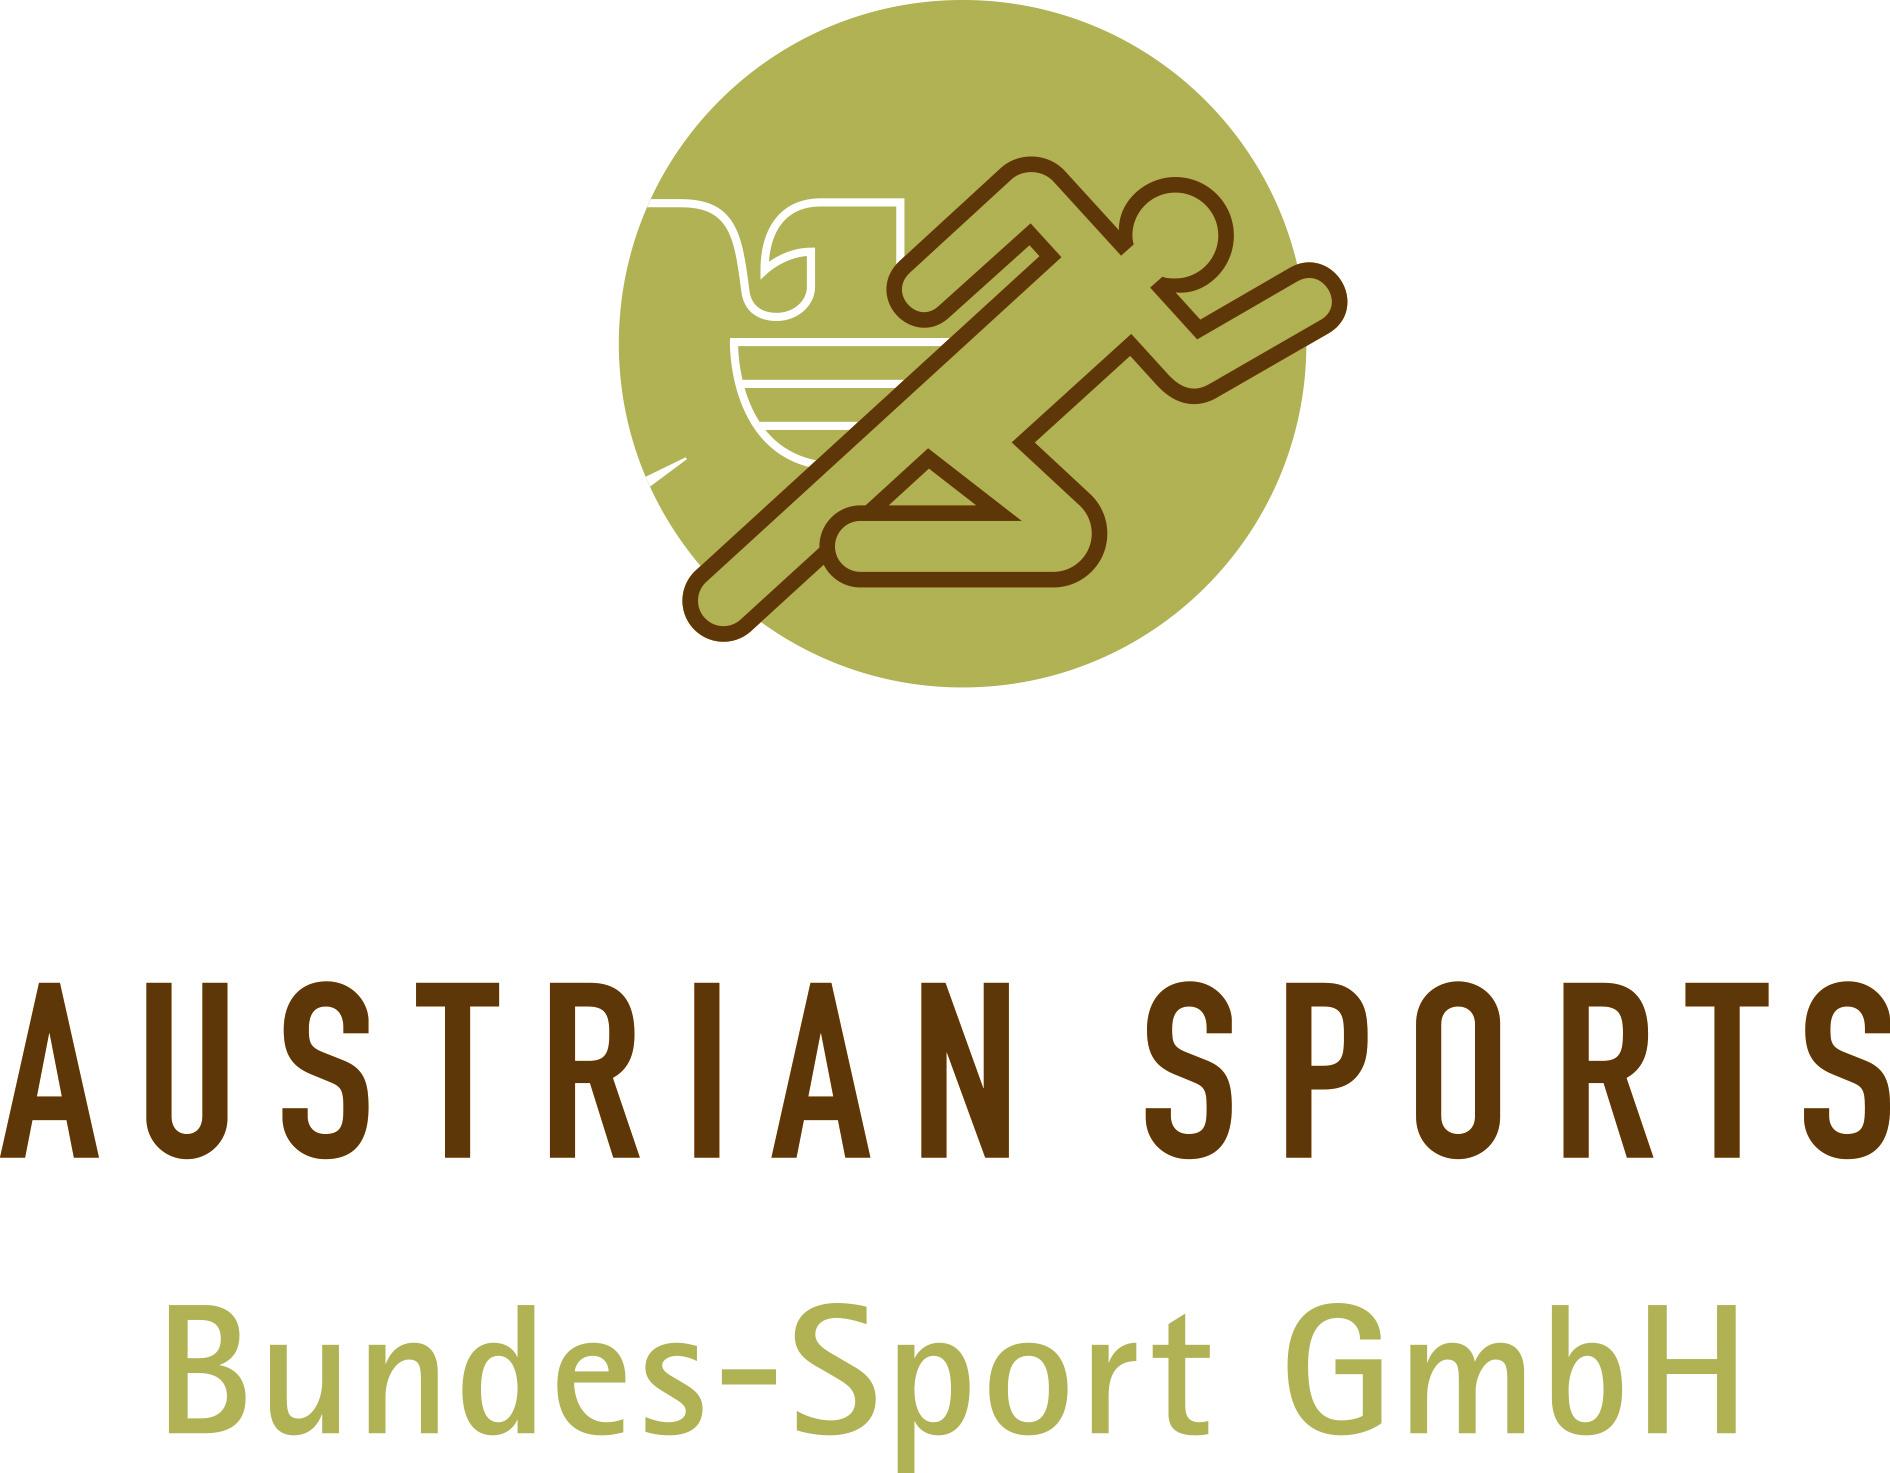 Austrian-Sports-hoch-4c.jpg